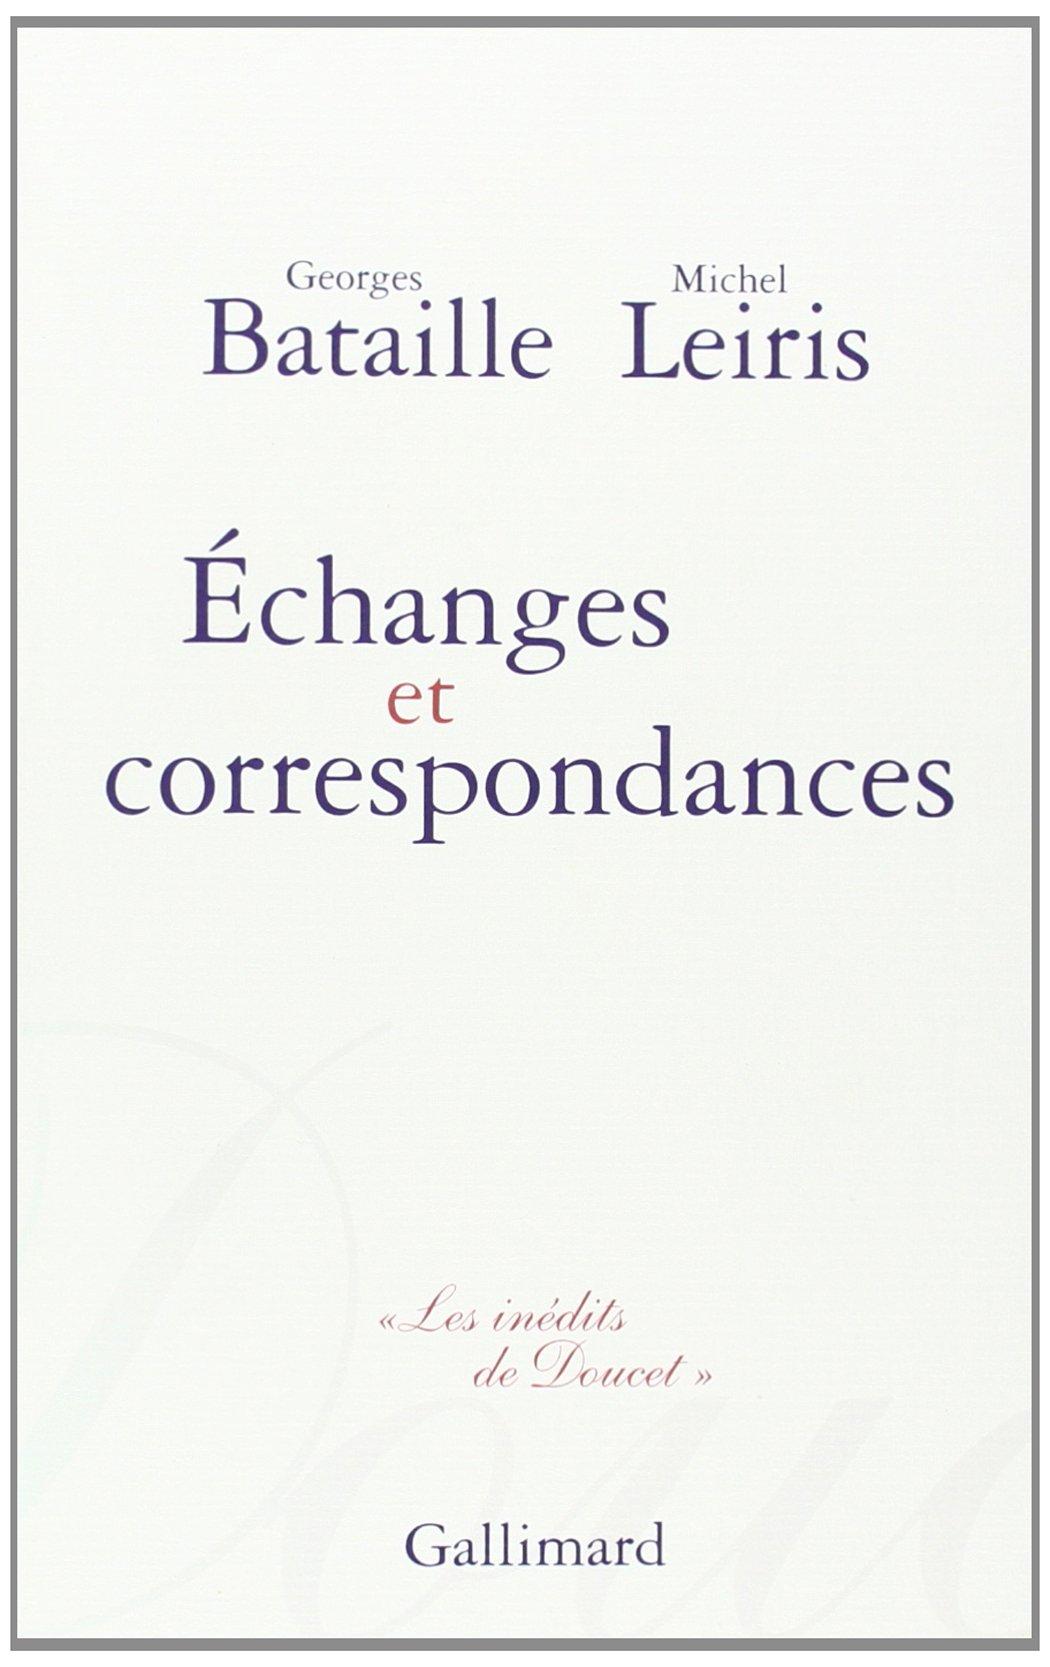 BATAILLE_LEIRIS